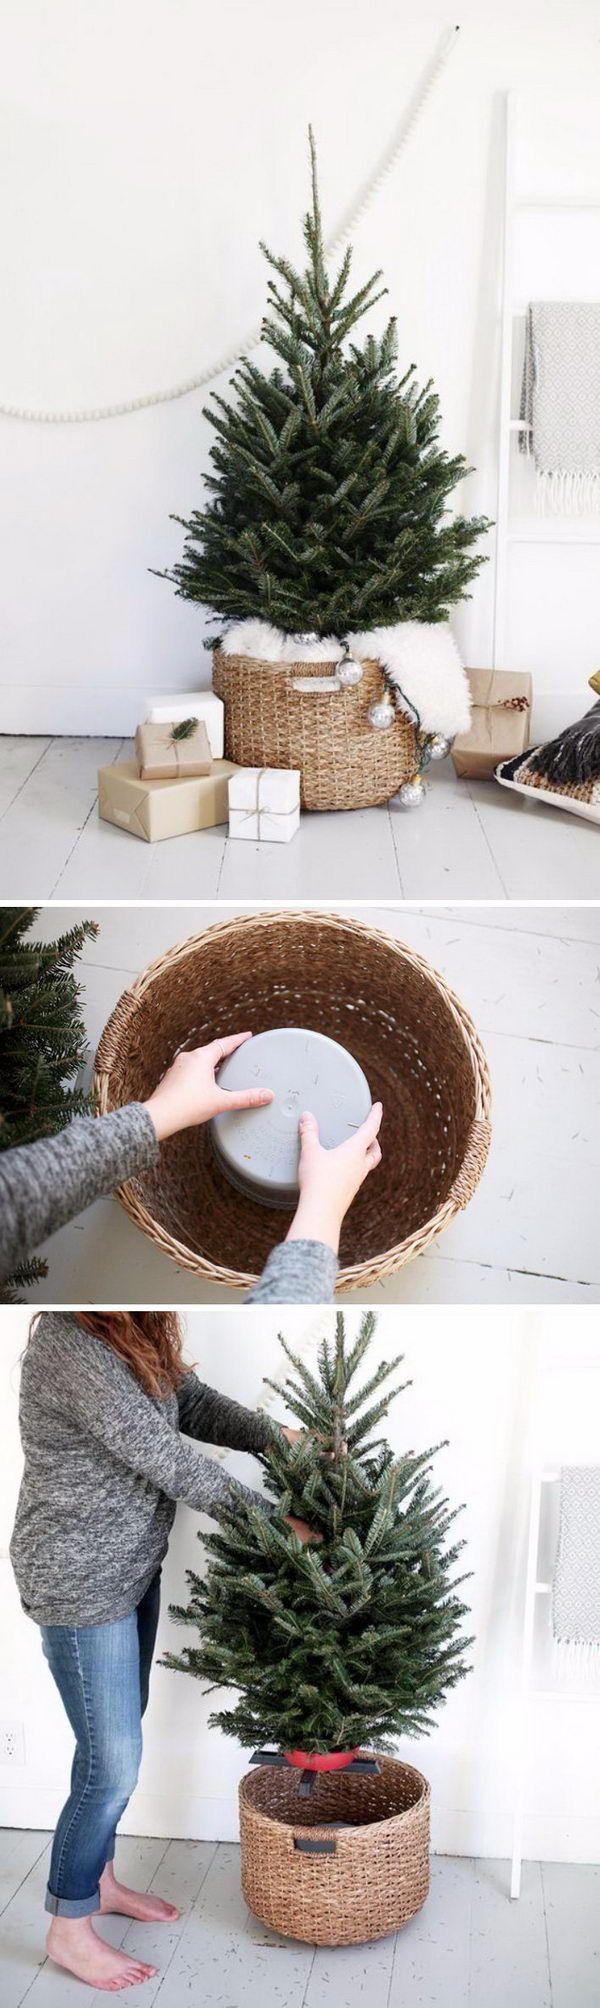 Diy Christmas Tree Stand Using Bucket Upside Down In A Large Basket Diy Christmas Tree Christmas Decorations Christmas Diy